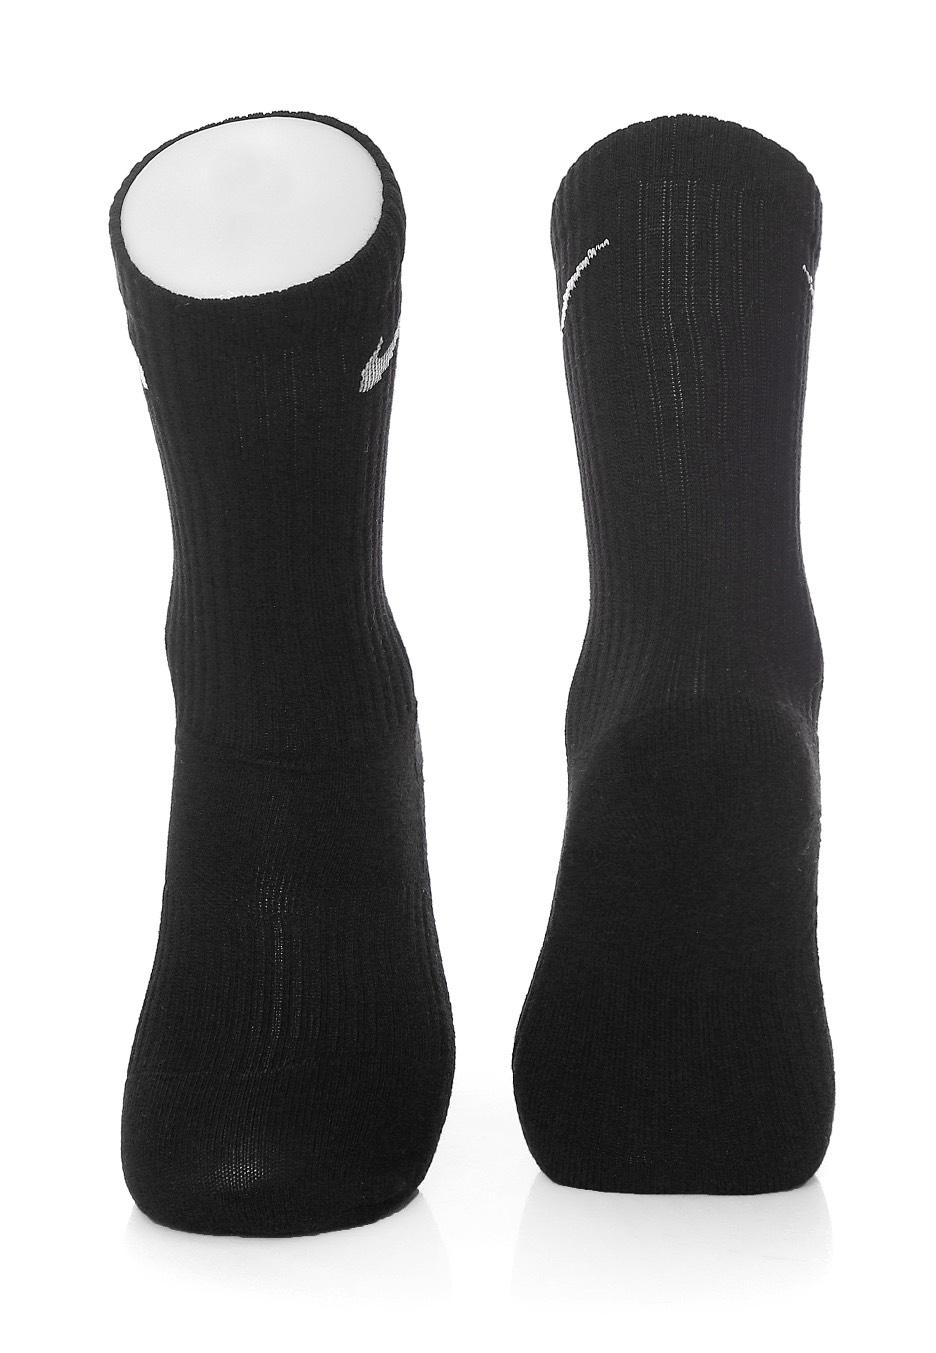 46fa5408c72 ... Nike - Peformance Cushion Crew Pack Of 3 Black White - Socks ...